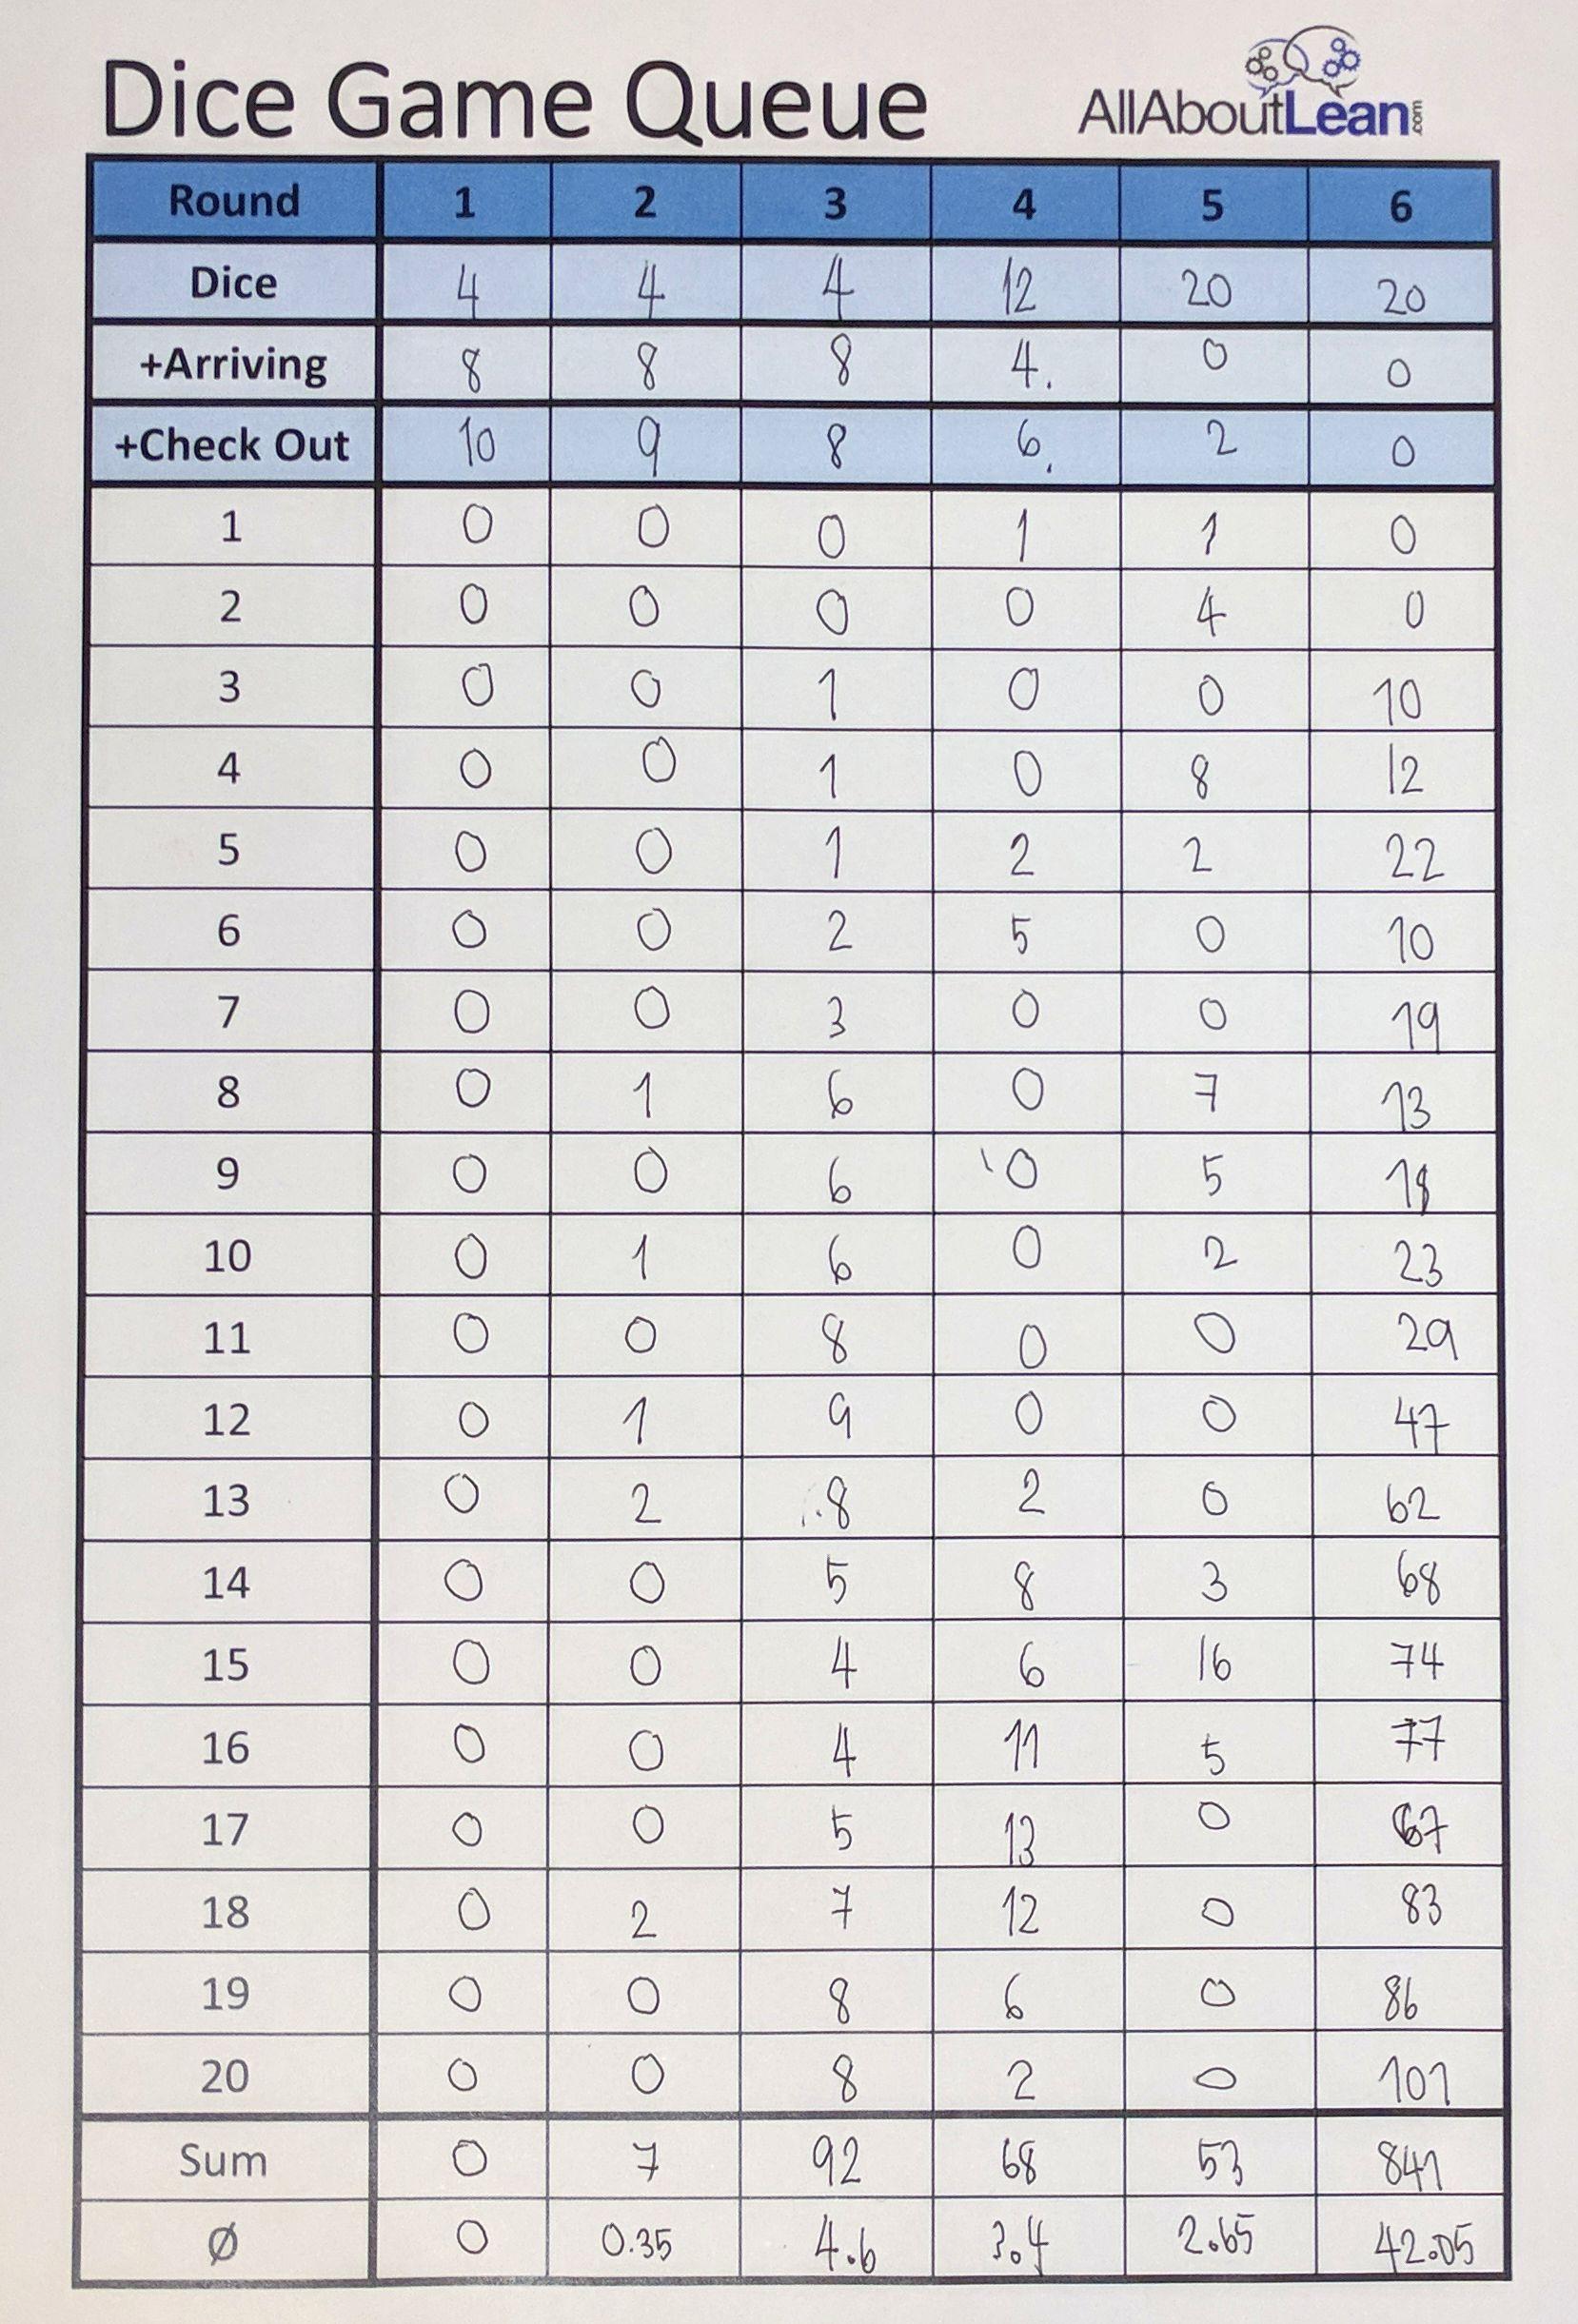 Dice Game Sample Data Sheet | Allaboutlean And Sample Spreadsheet Data